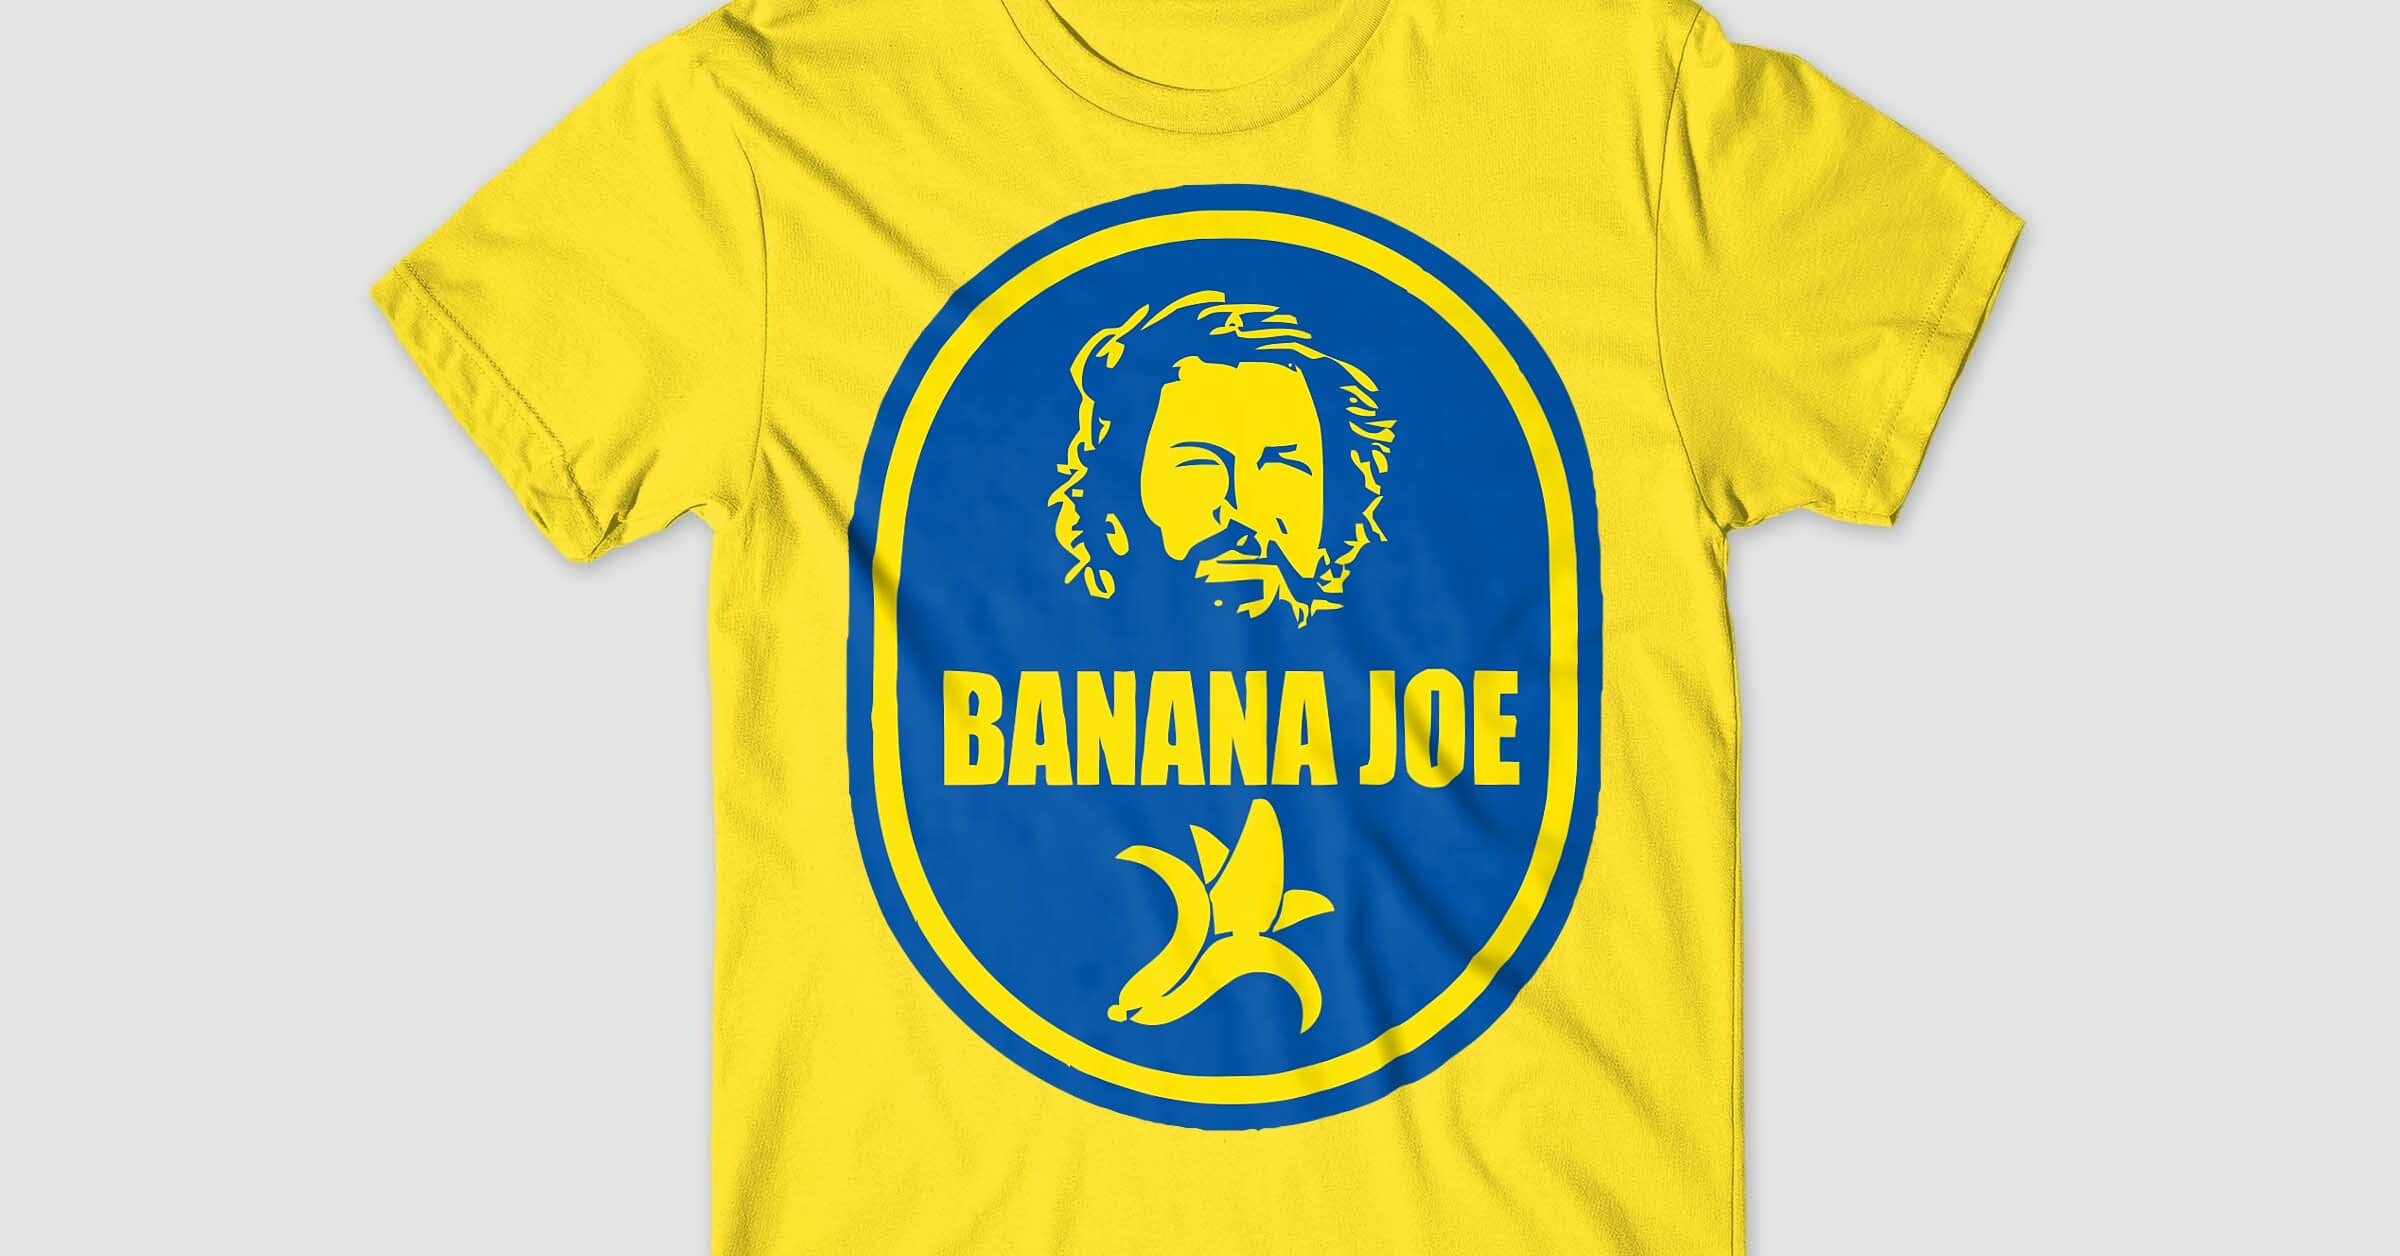 Bud Spencer Banana Joe Póló - Bud Spencer d6e7d89b05